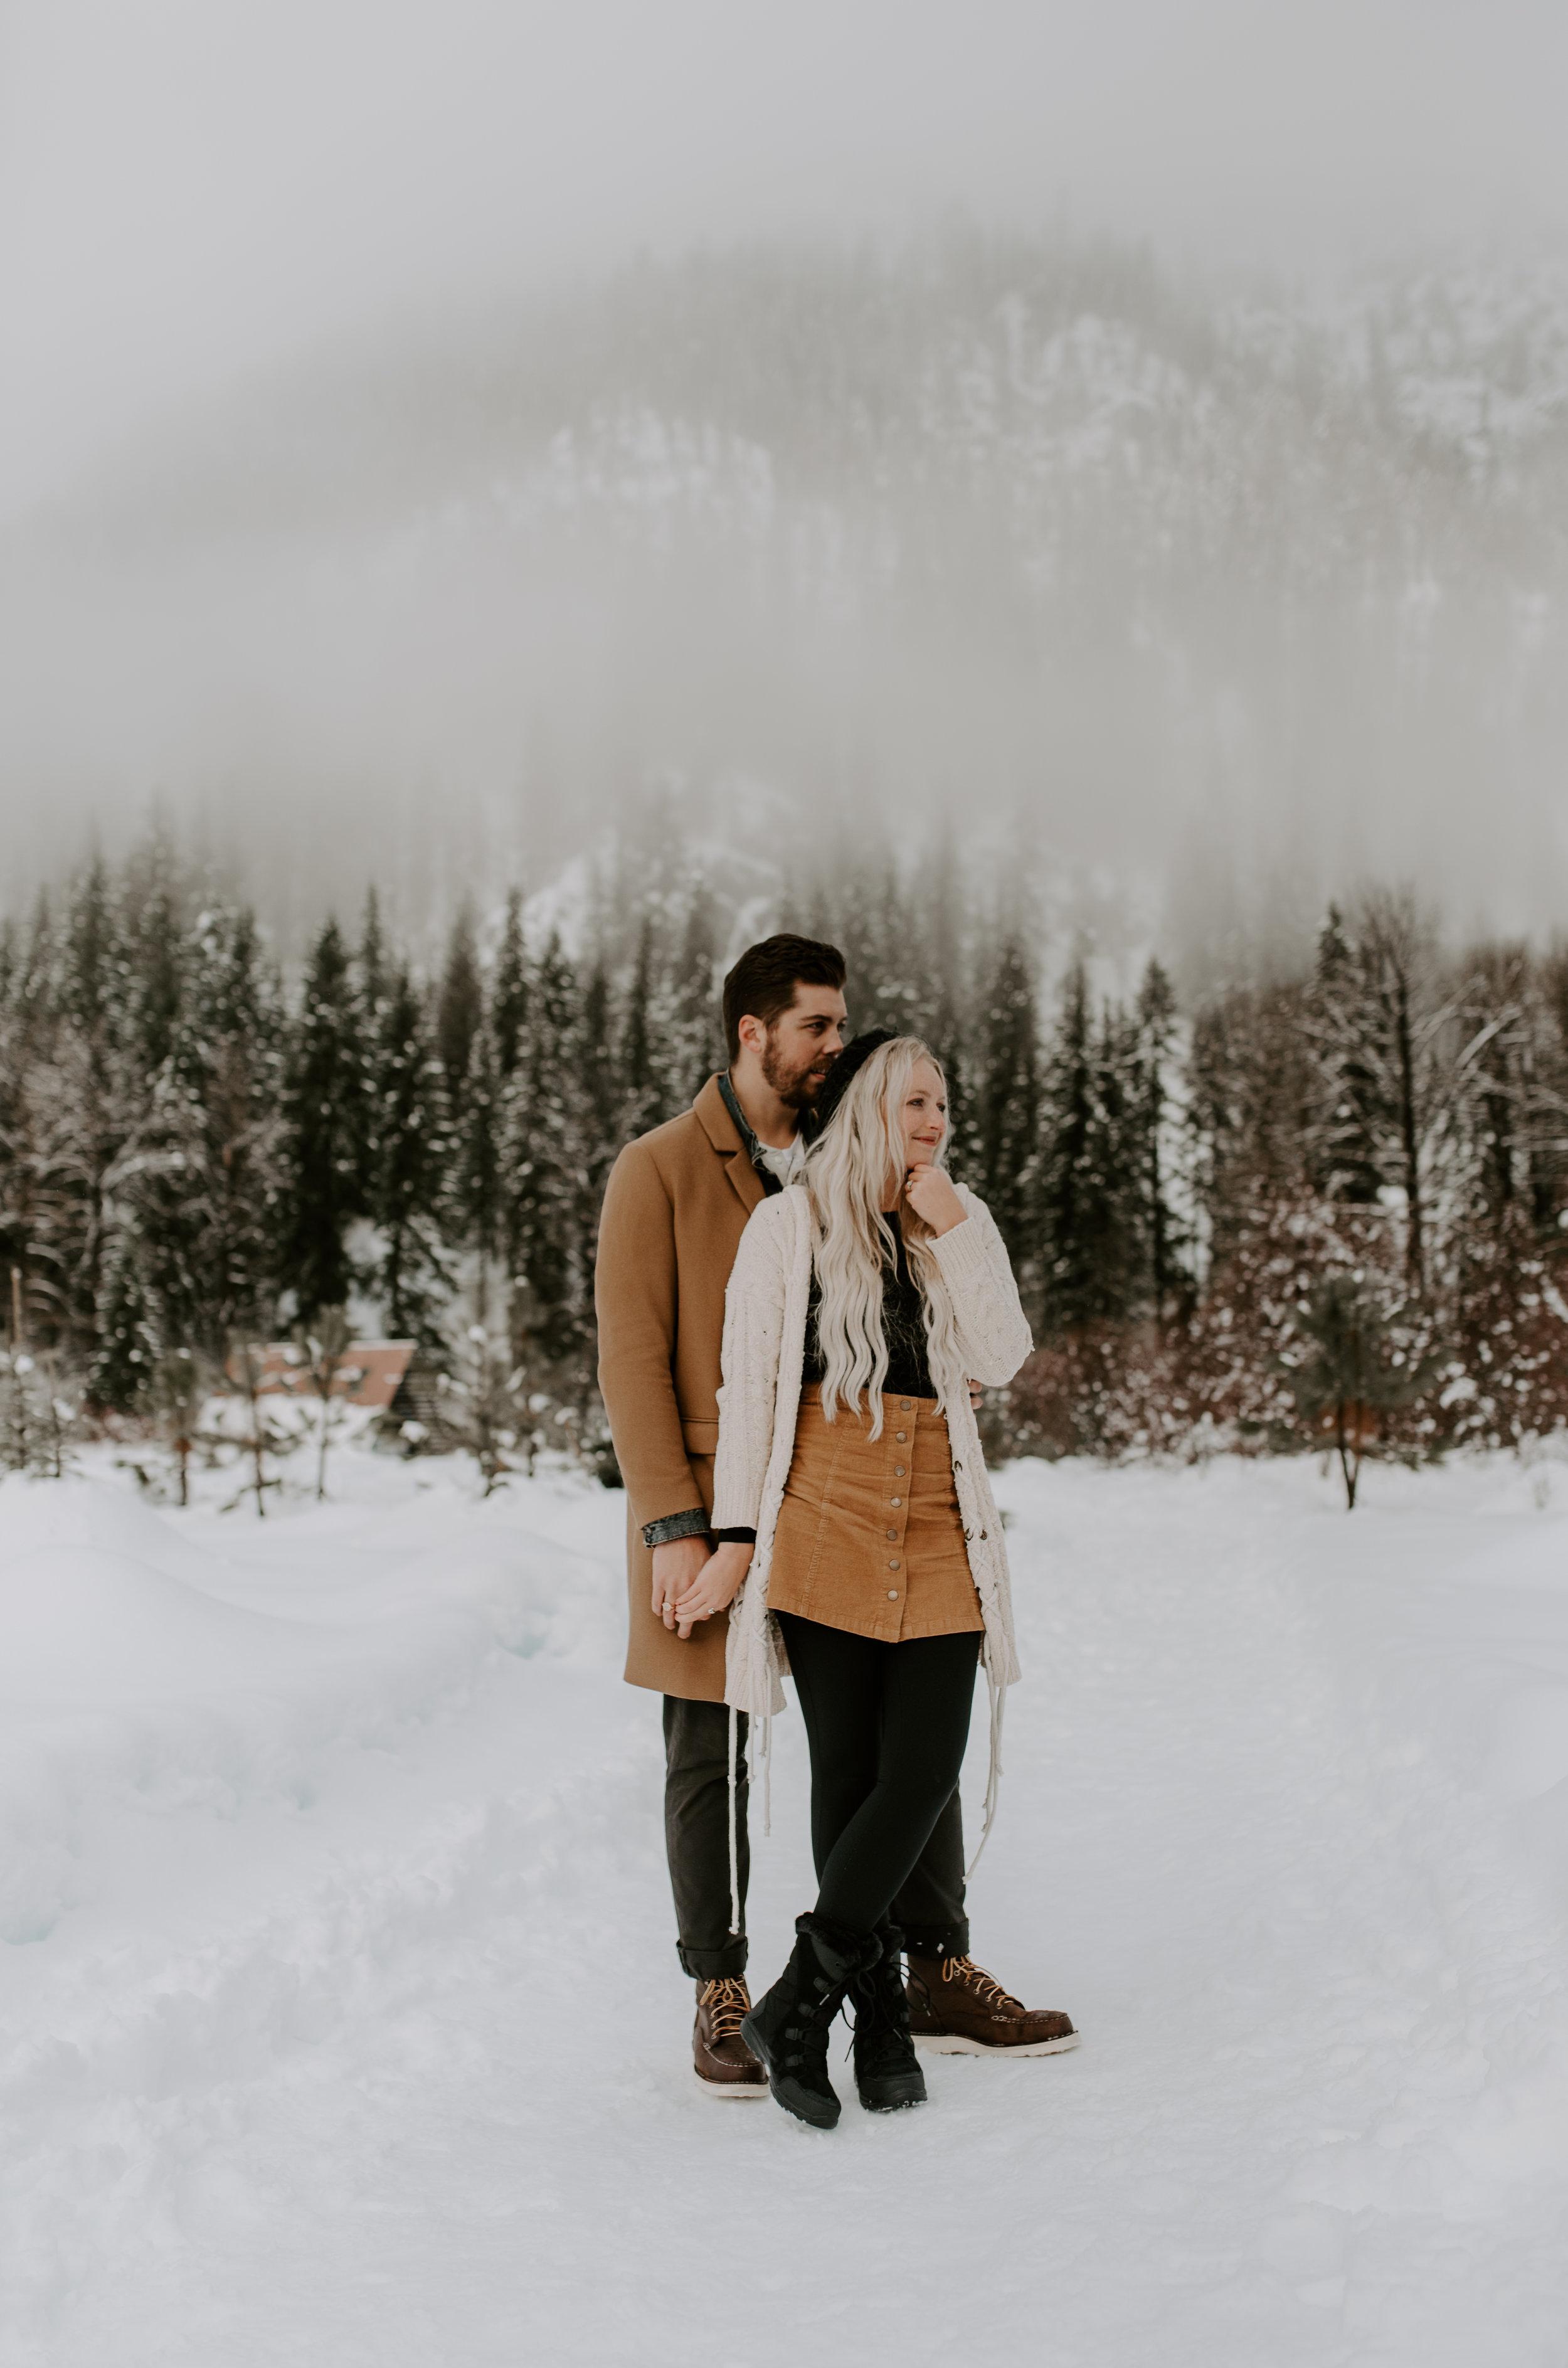 Wedding & elopement photography in Leavenworth, Washington.